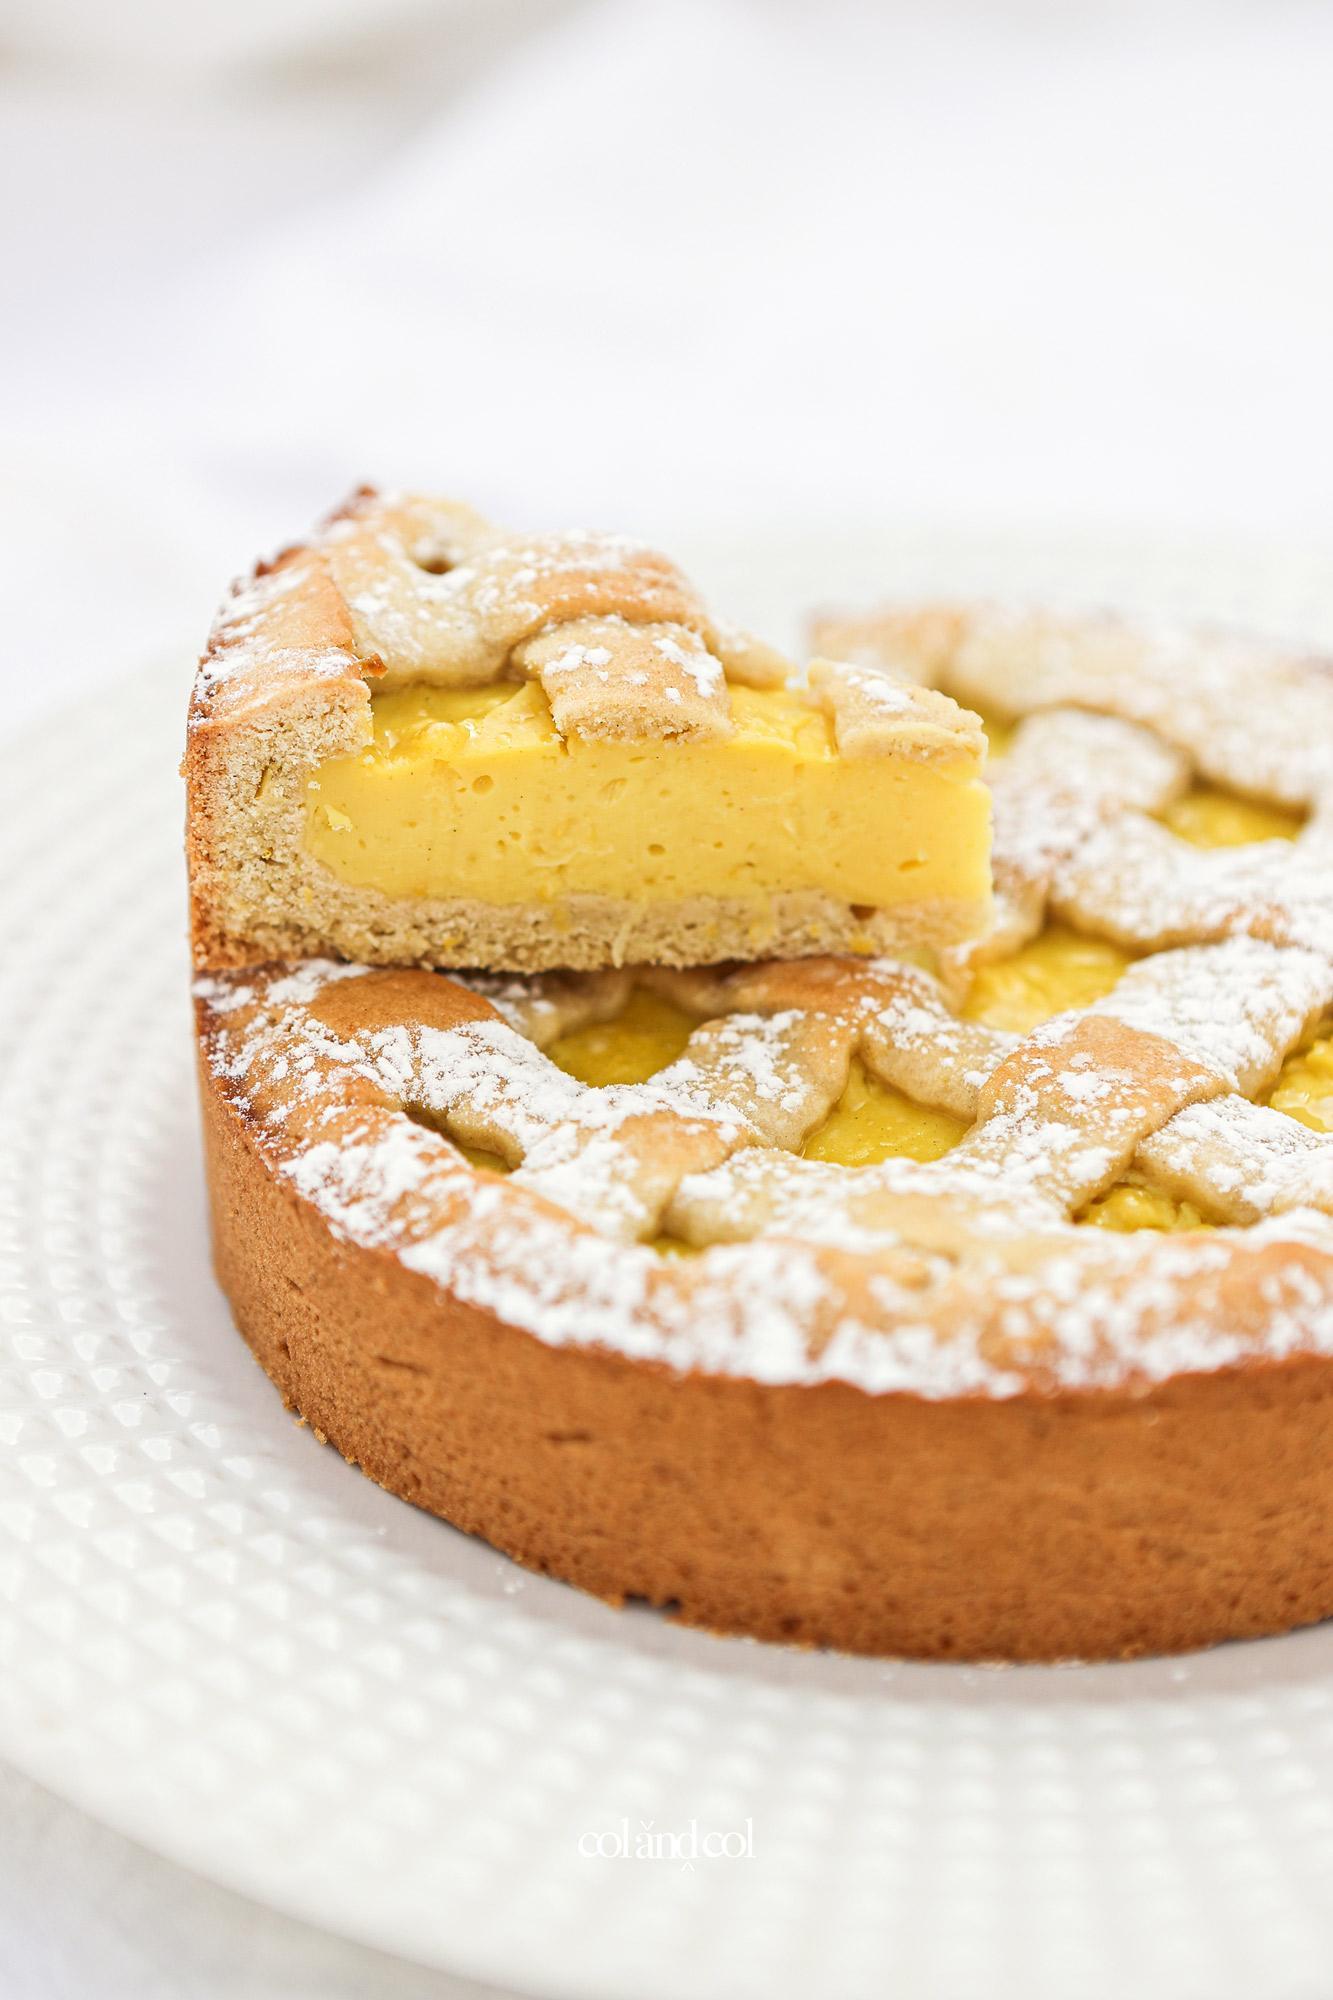 Pastel con crema de limon